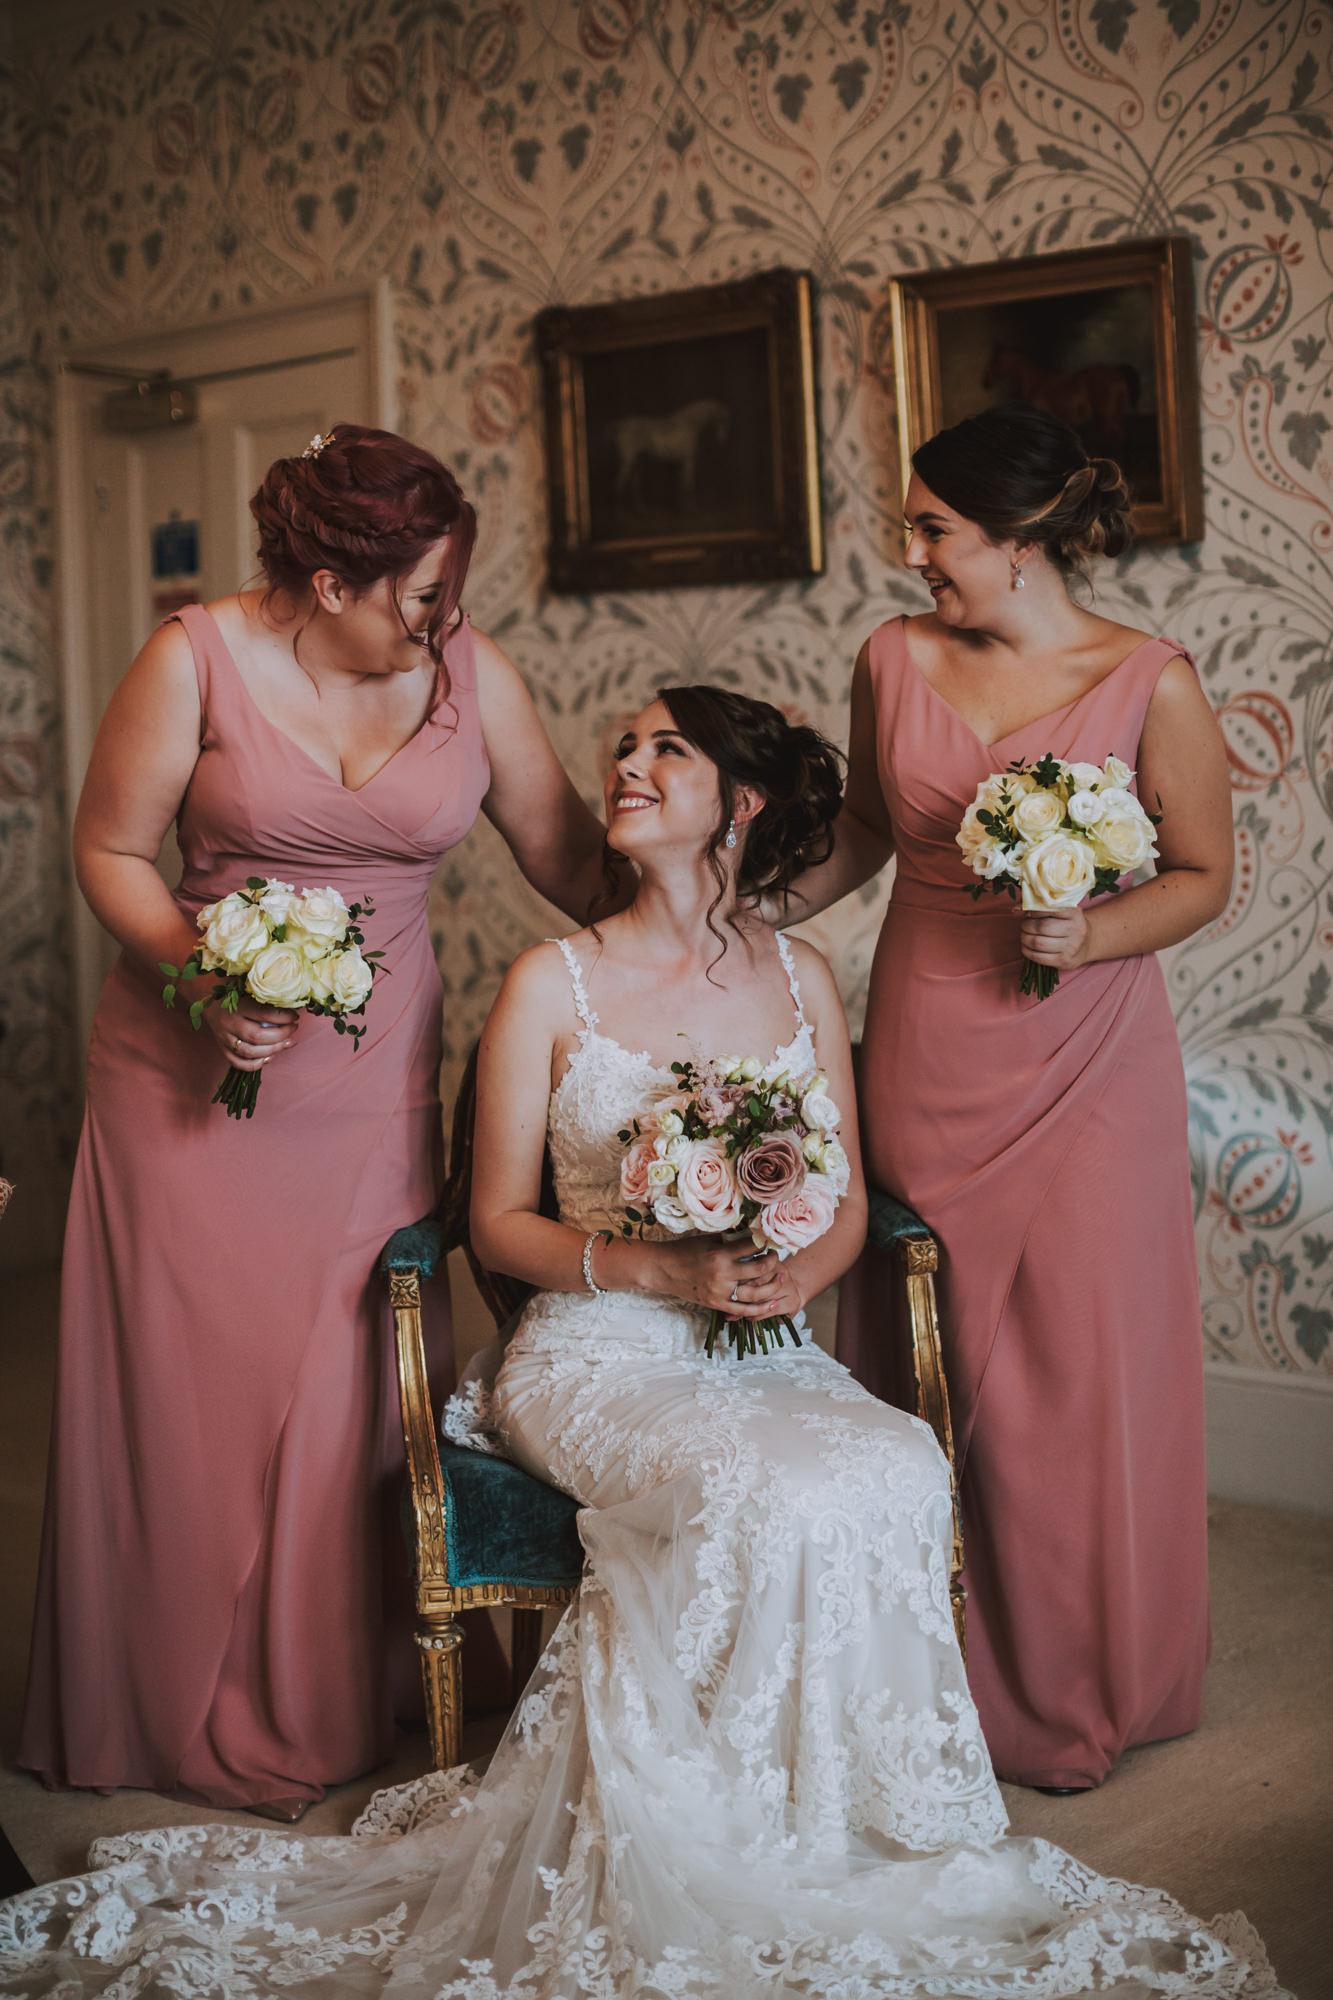 hodsock priory wedding photographers blog33.jpg